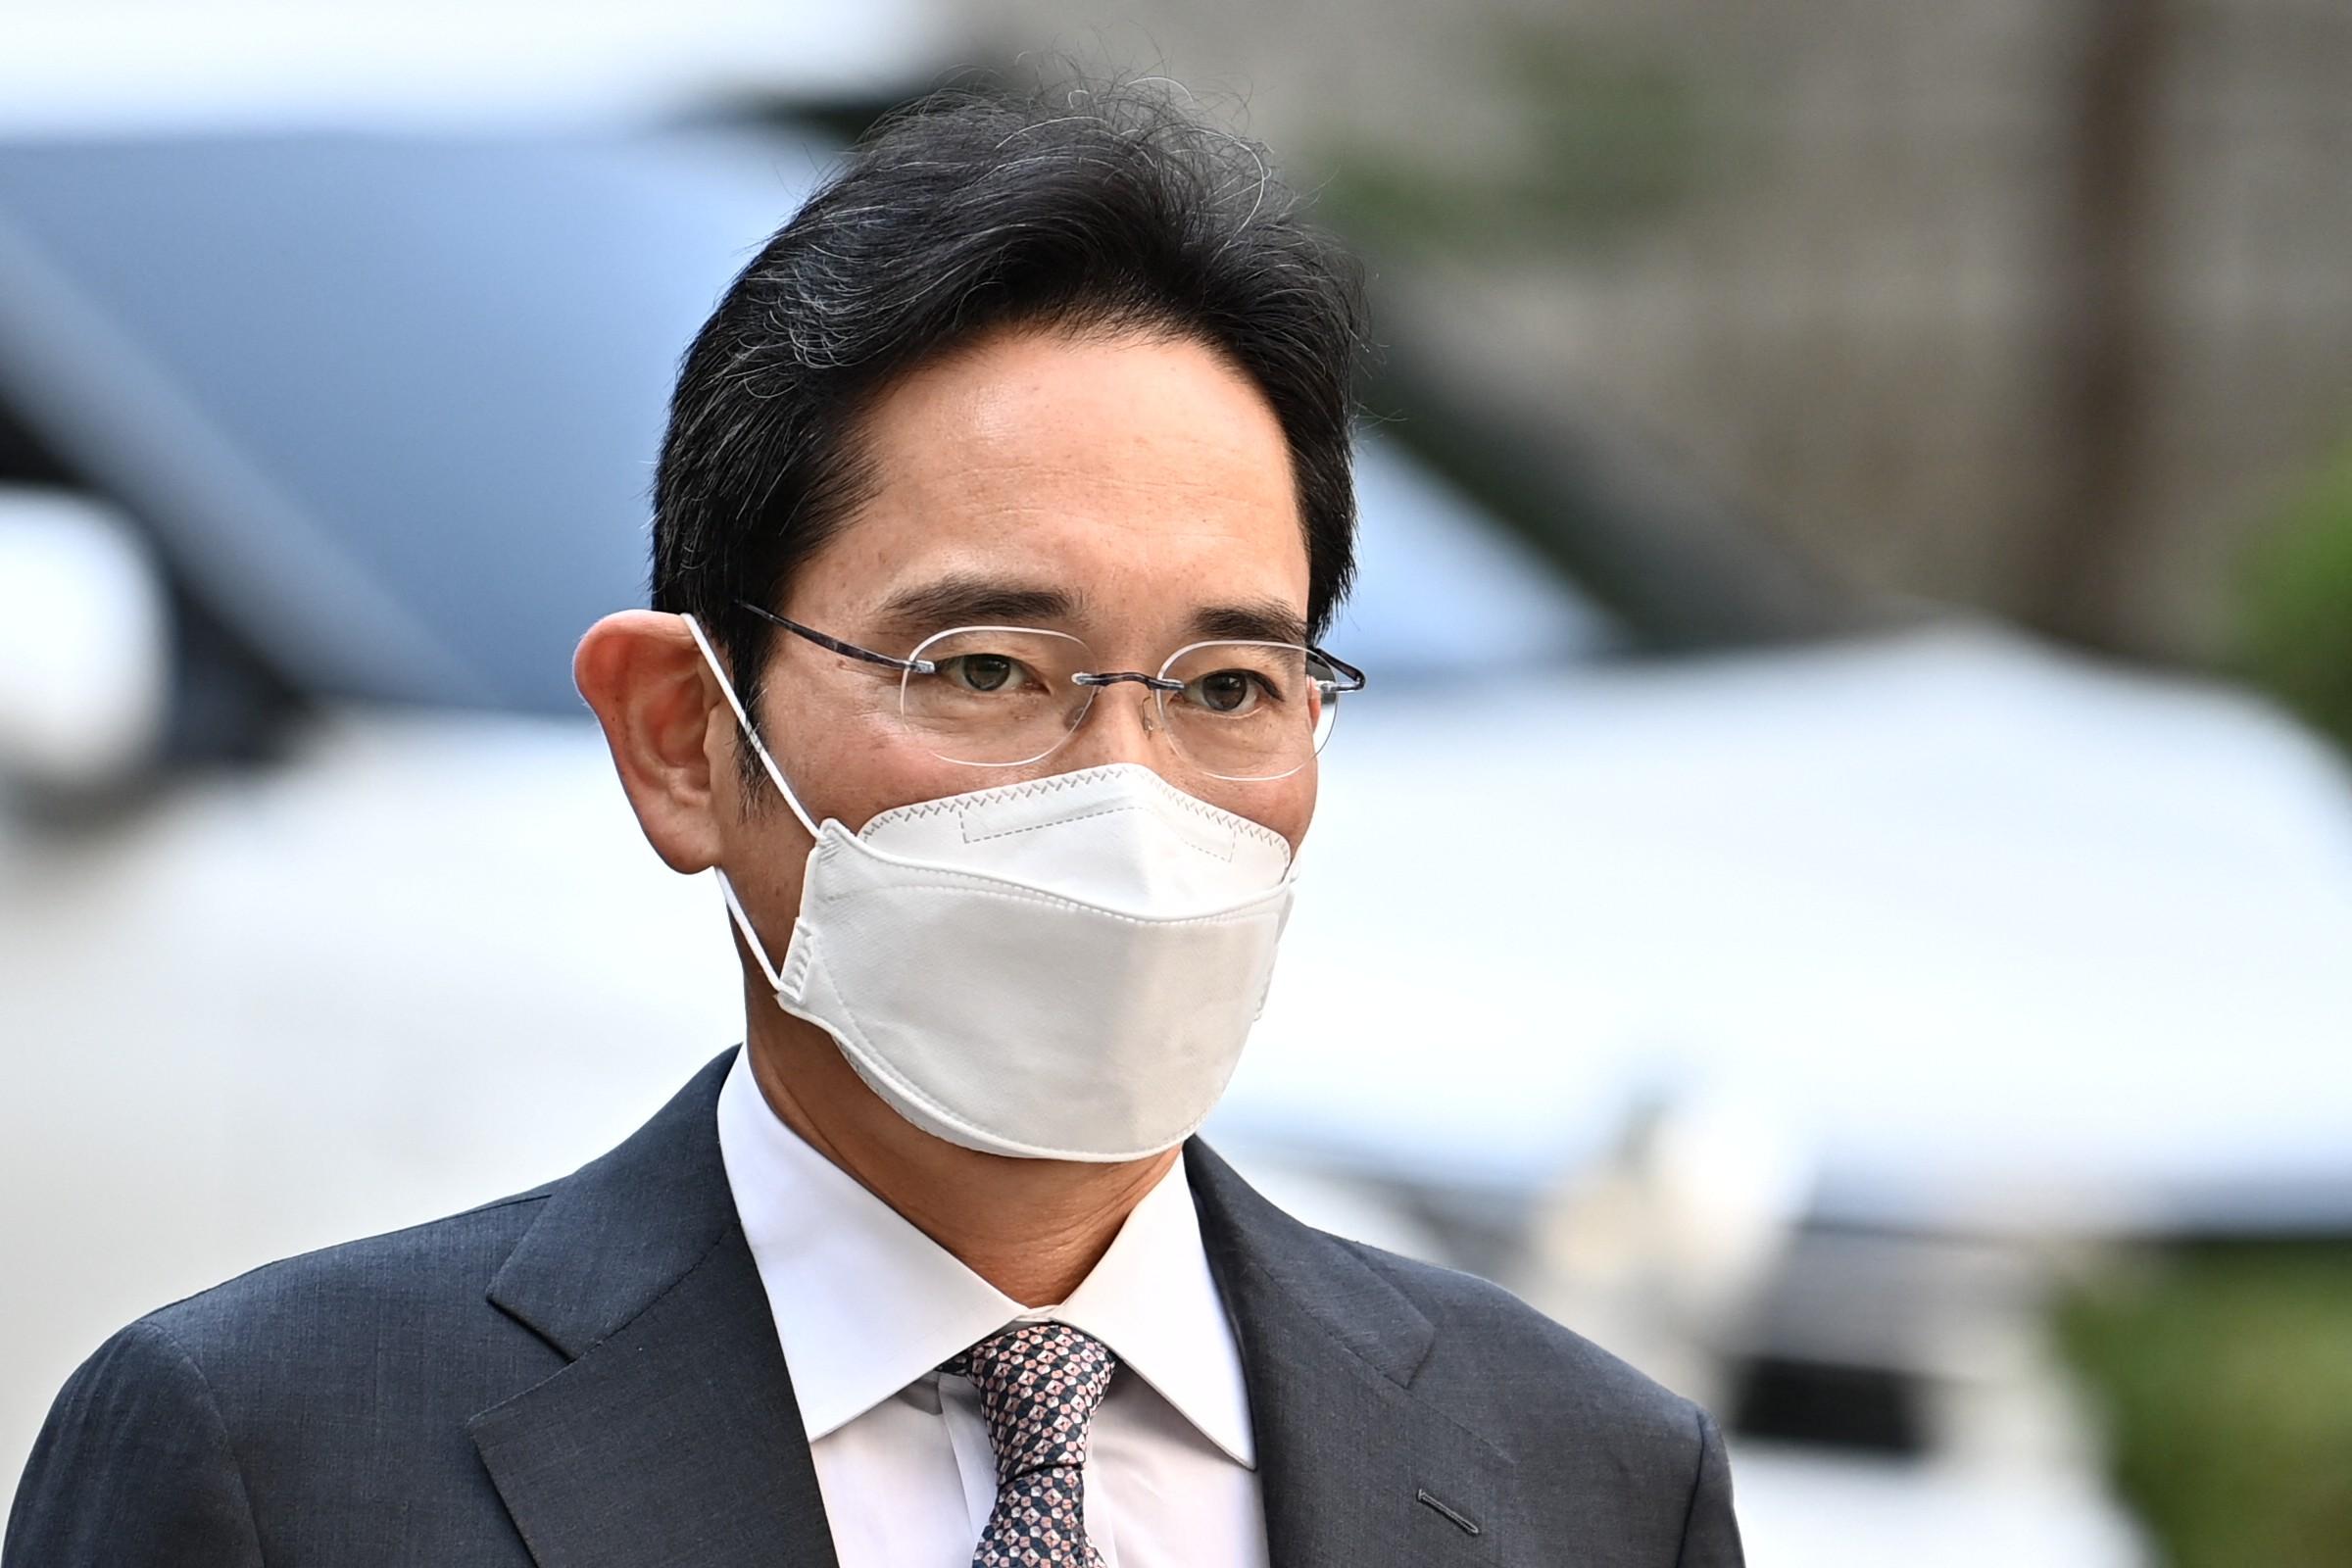 Herdeiro da Samsung é condenado por consumo ilegal de anestésico